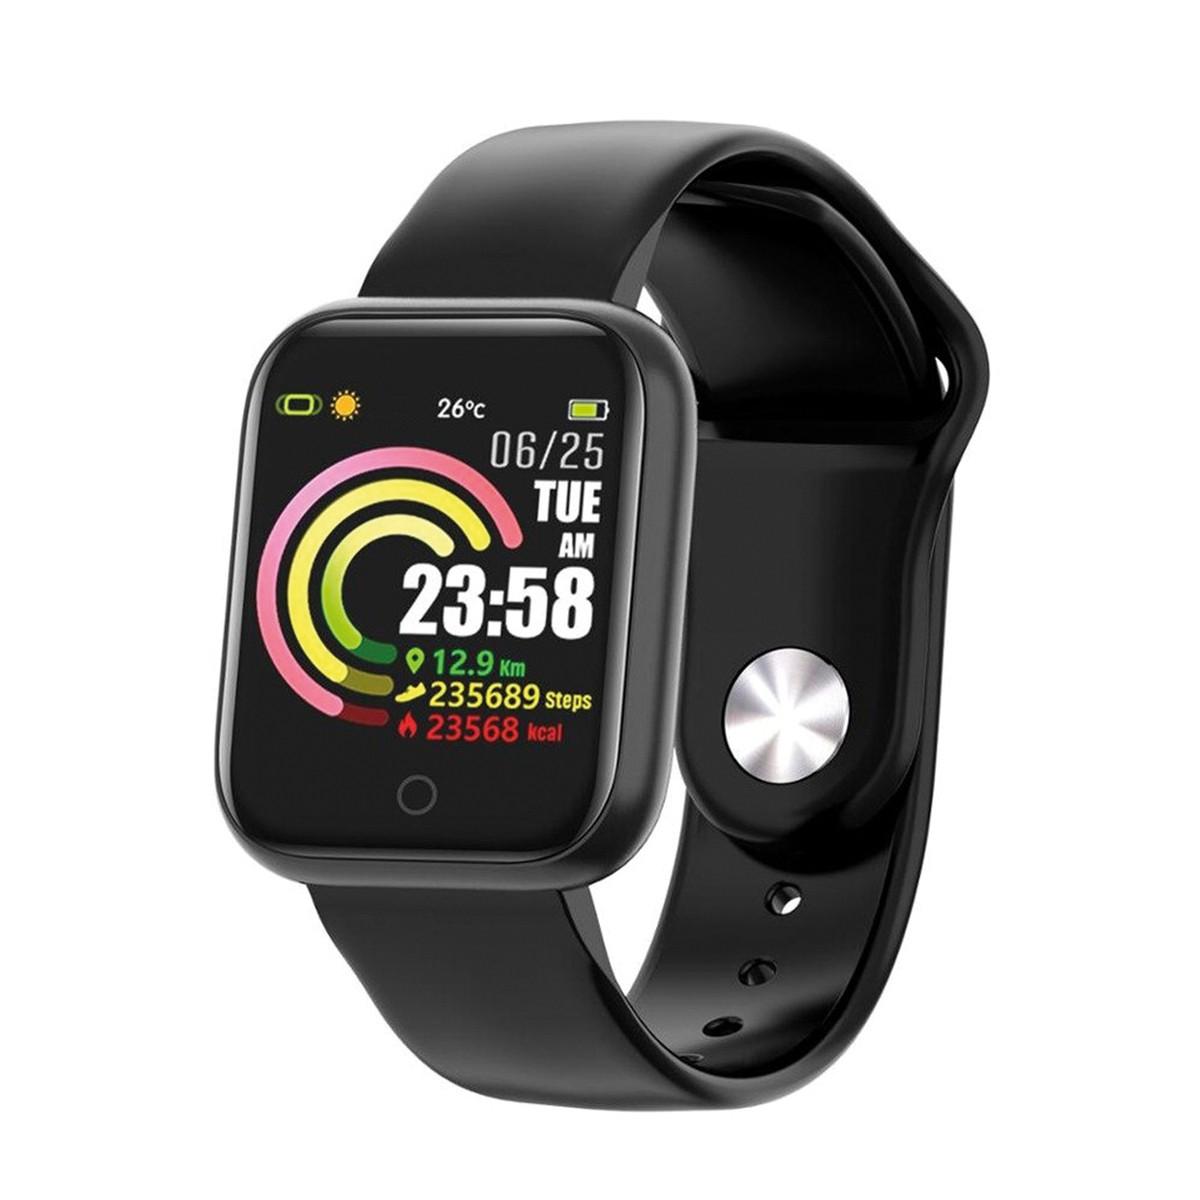 Smartwatch Inteligente OEX Ace, Bluetooth, Medidor de Frequência Cardíaca, A Prova d´Água, Preto - PS300